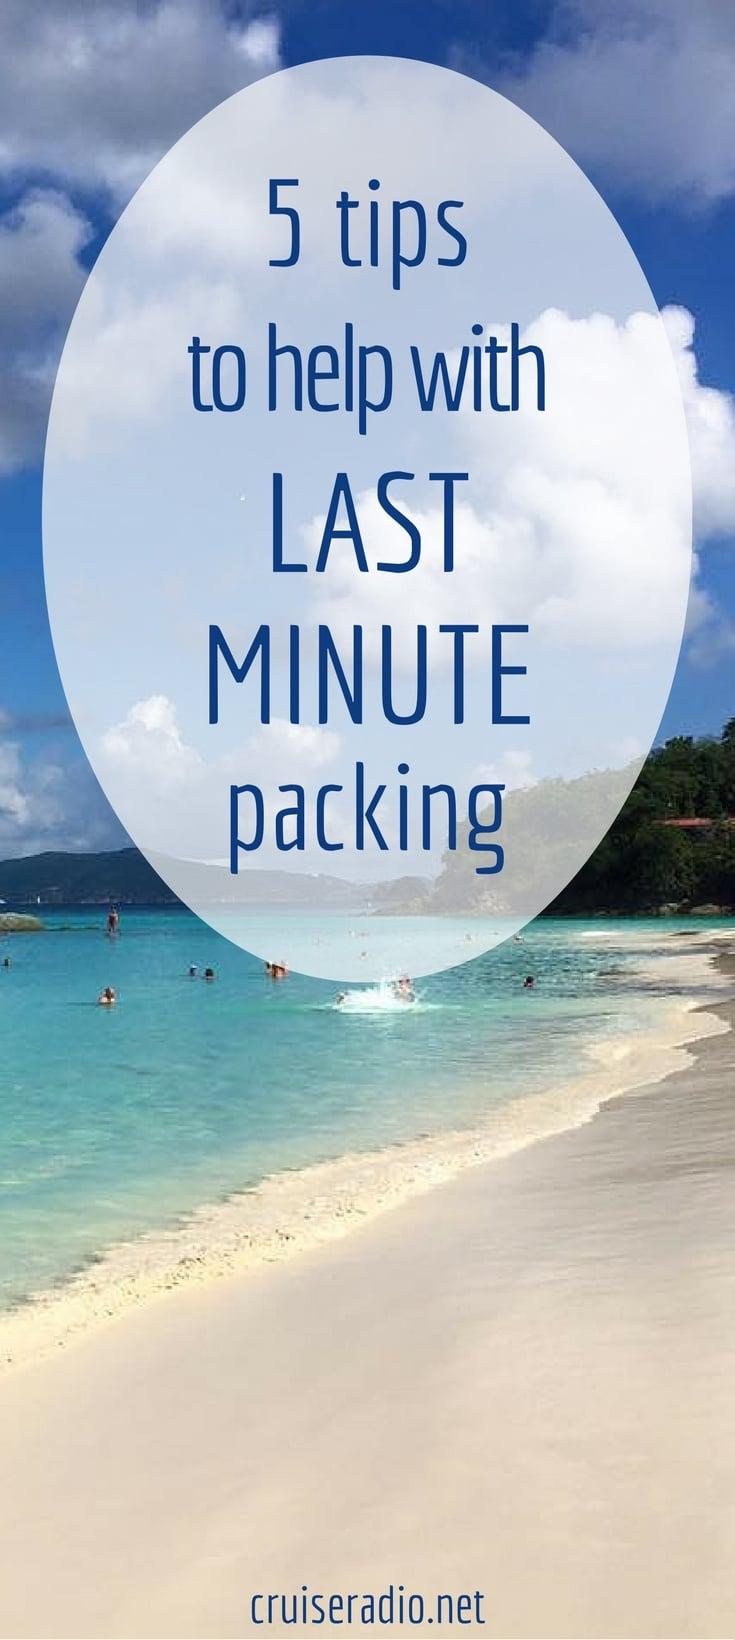 #packing #traveltips #cruise #travel #vacation #beach